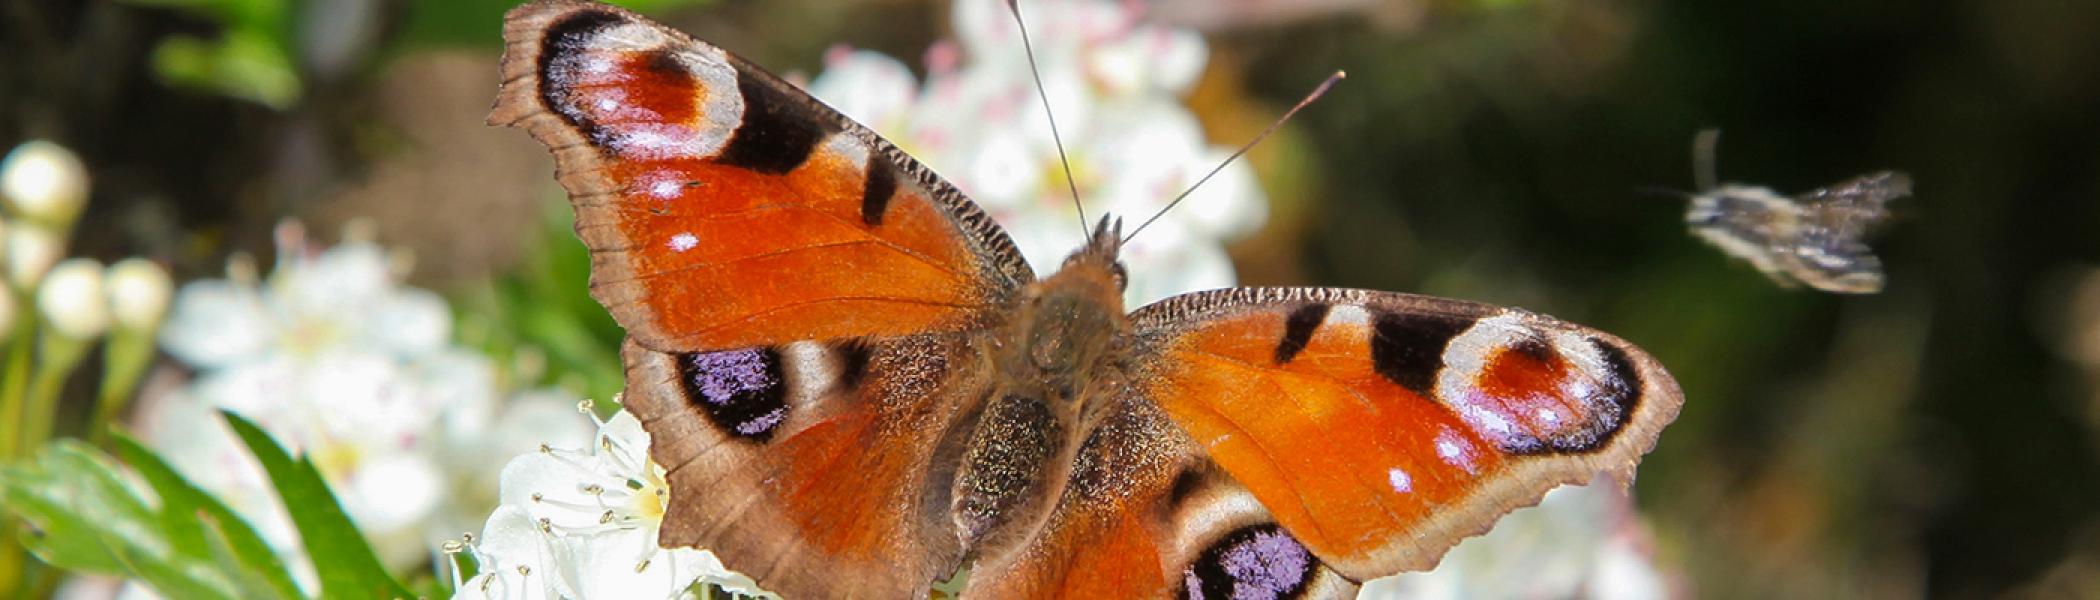 An orange butterfly sitting on a white flower